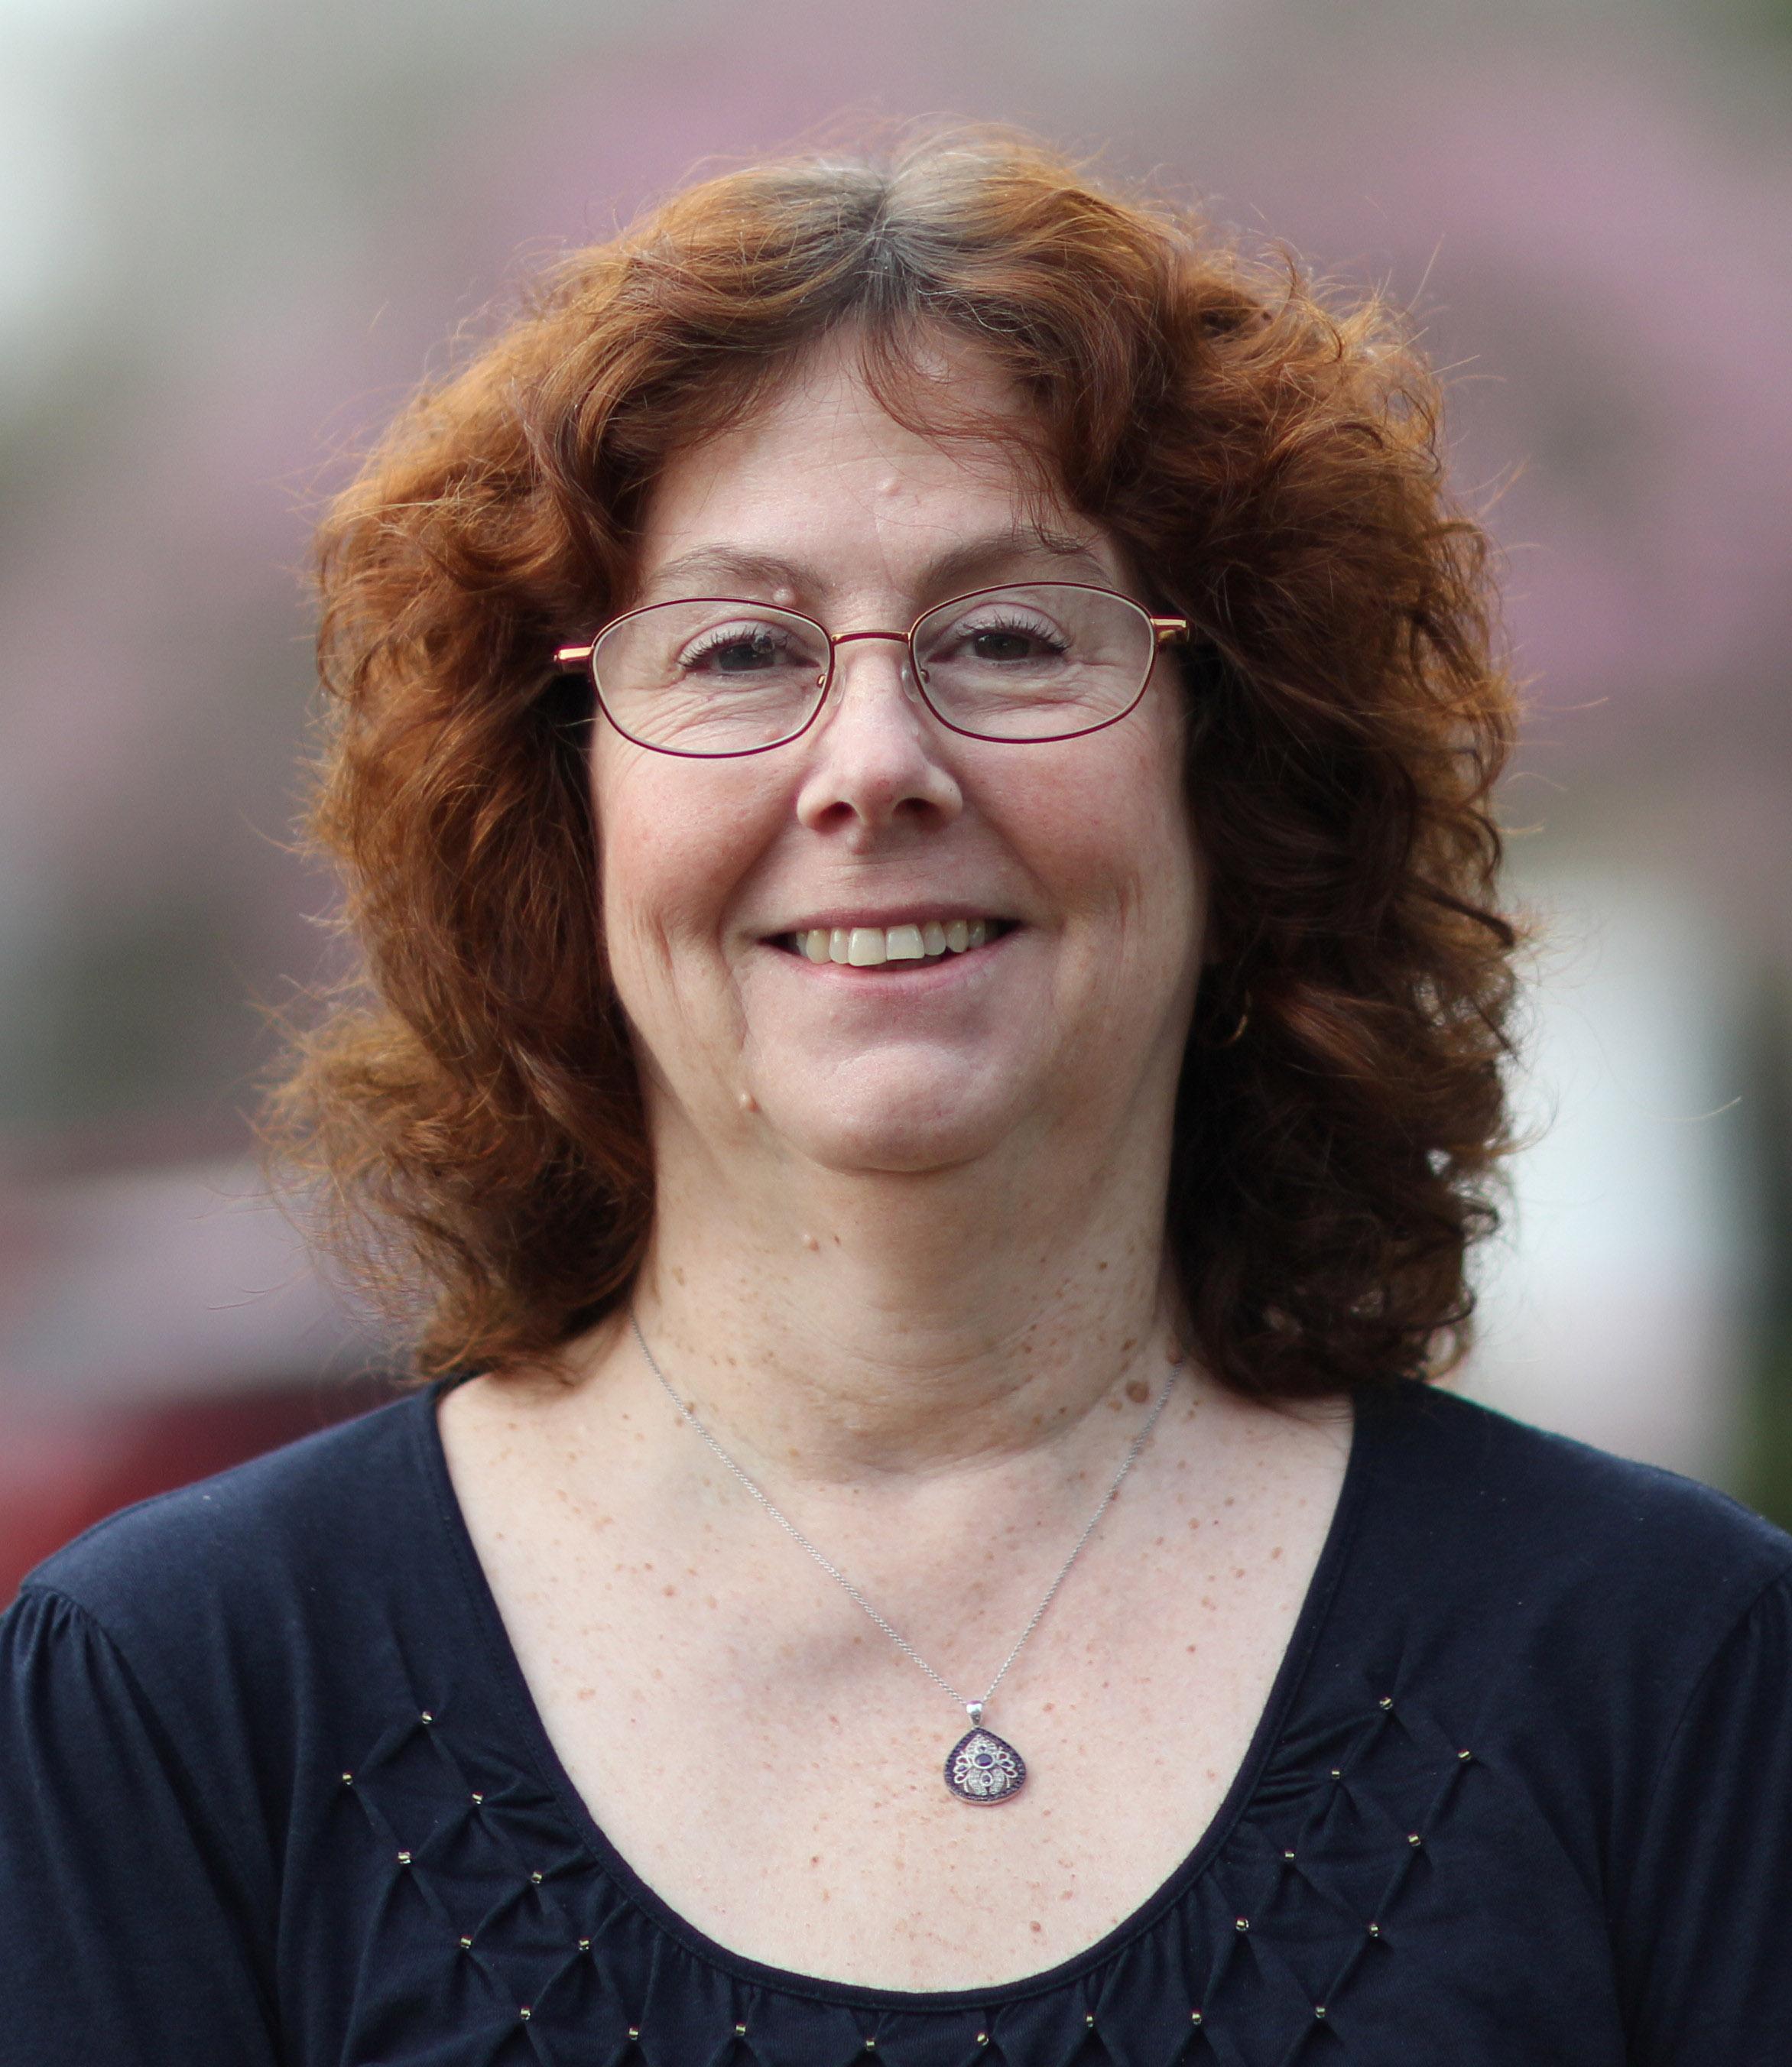 Karen Ceurvorst